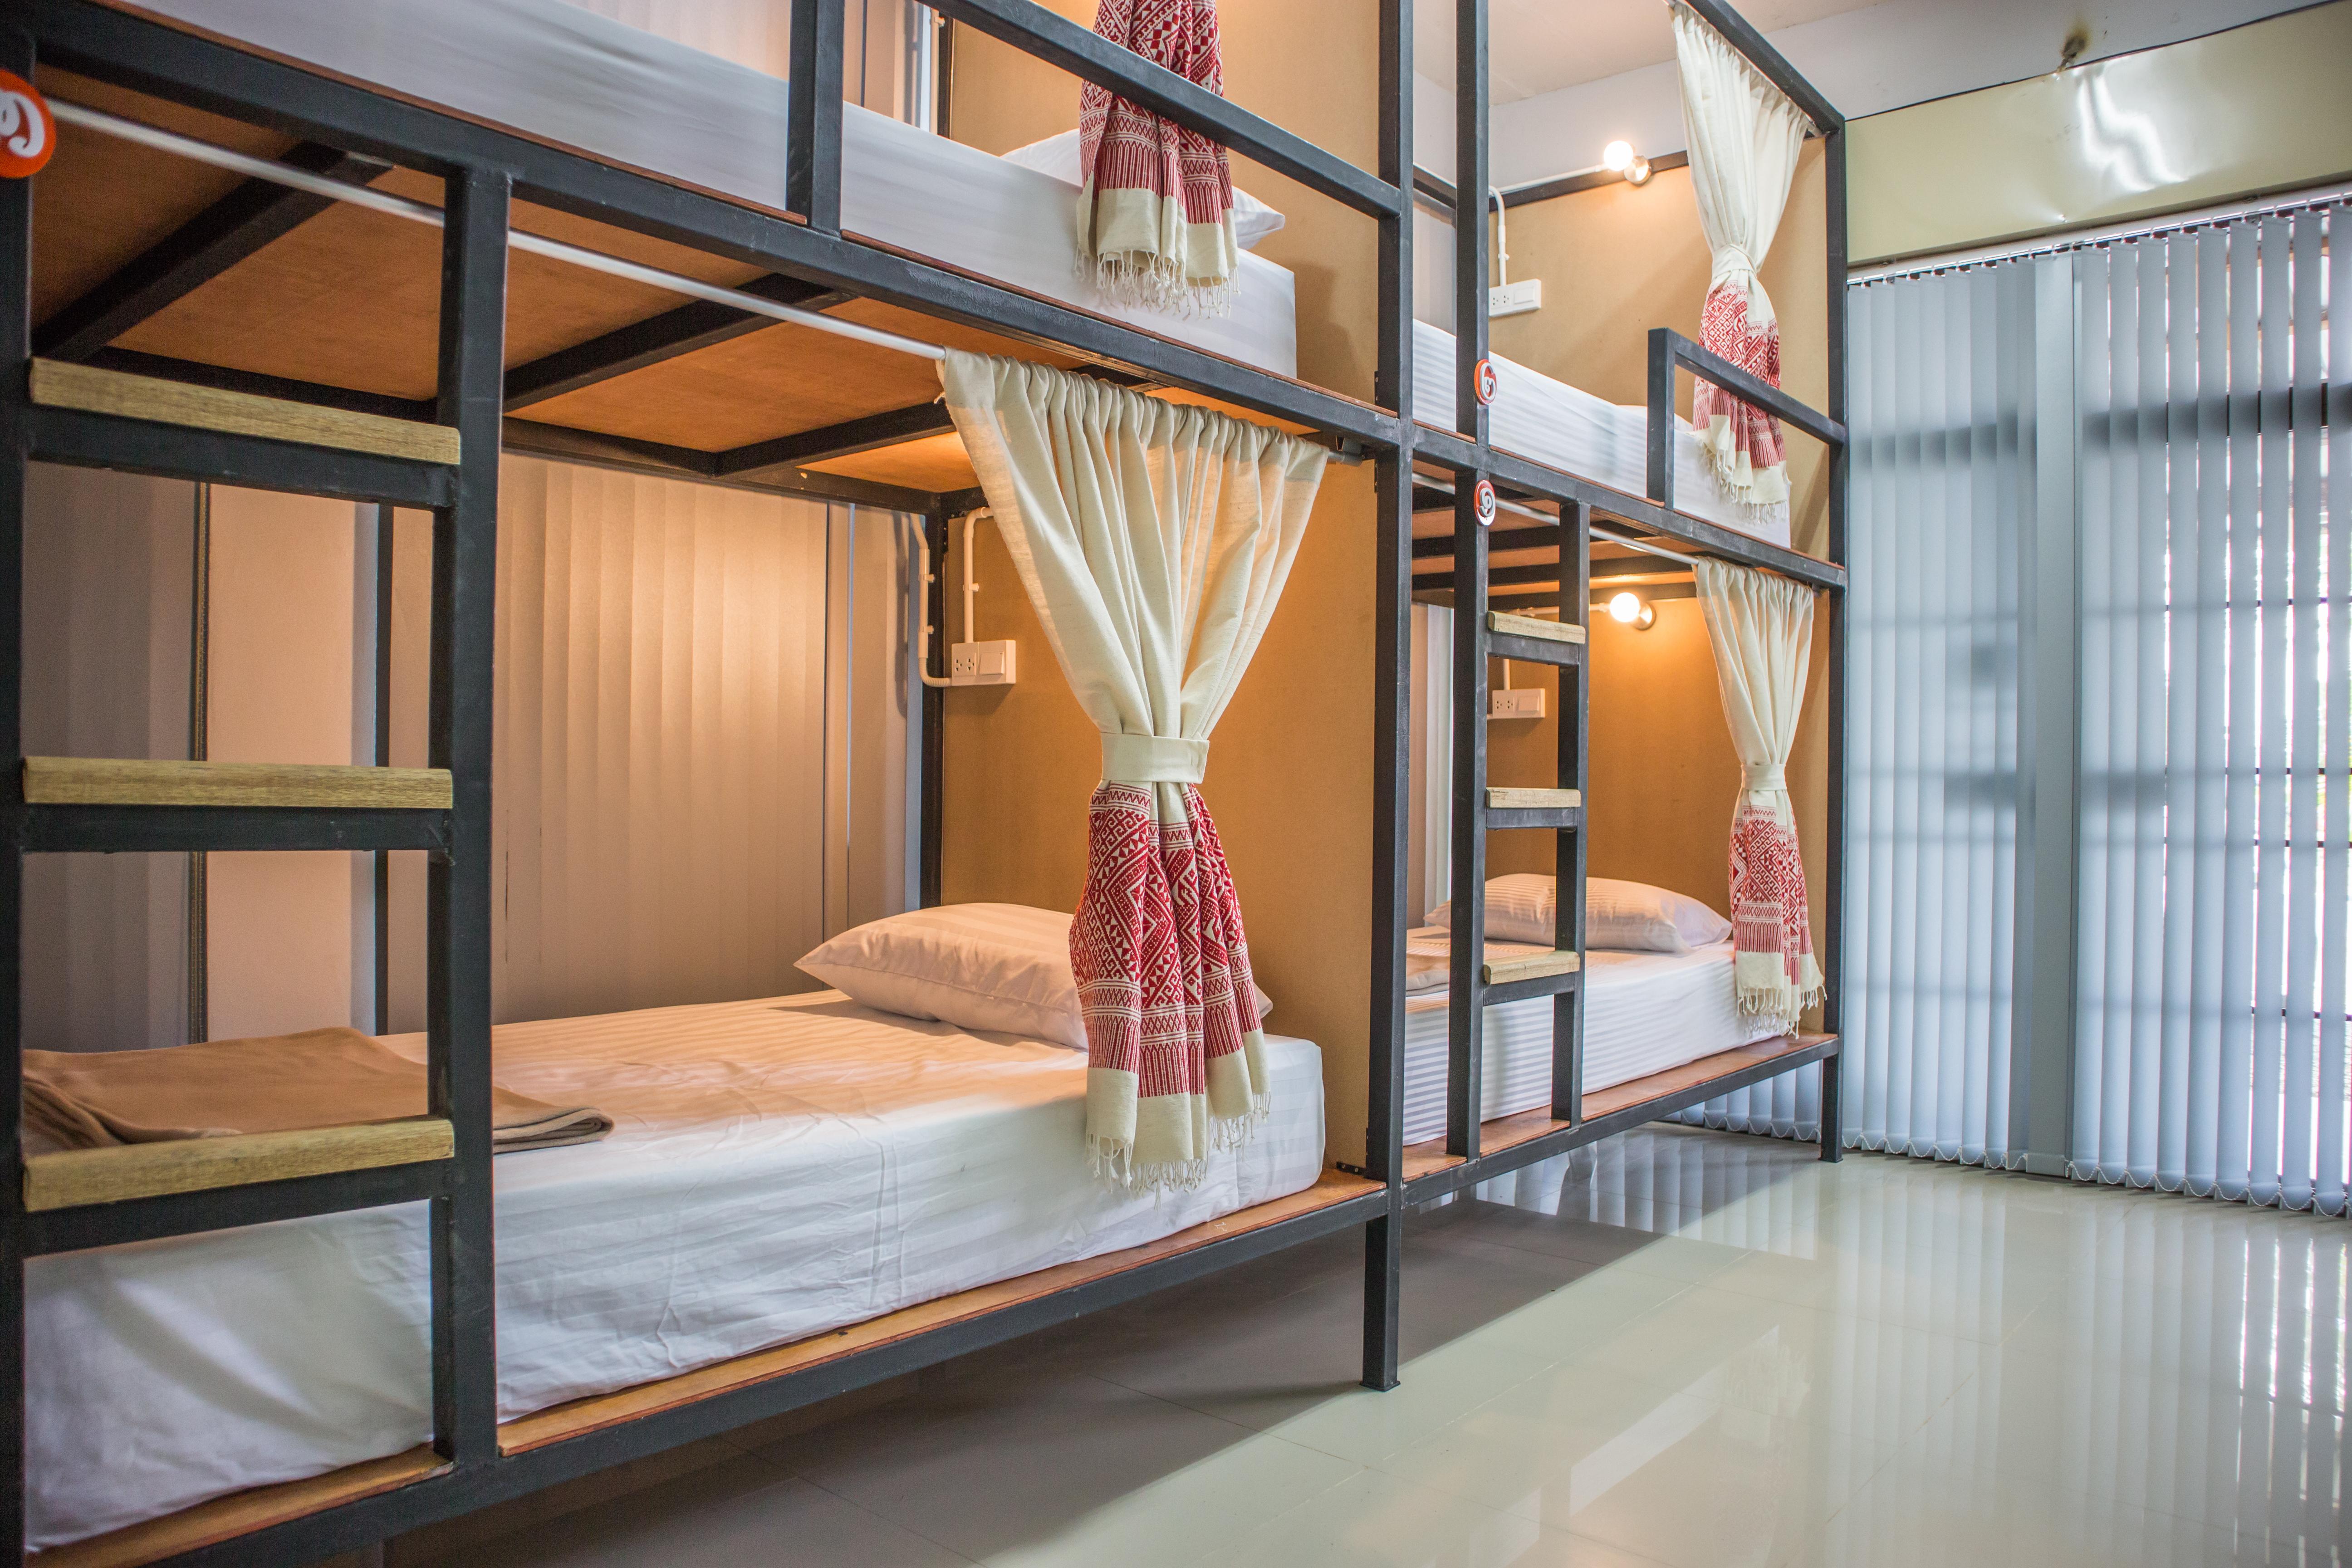 Sleep24 Pua Hostel